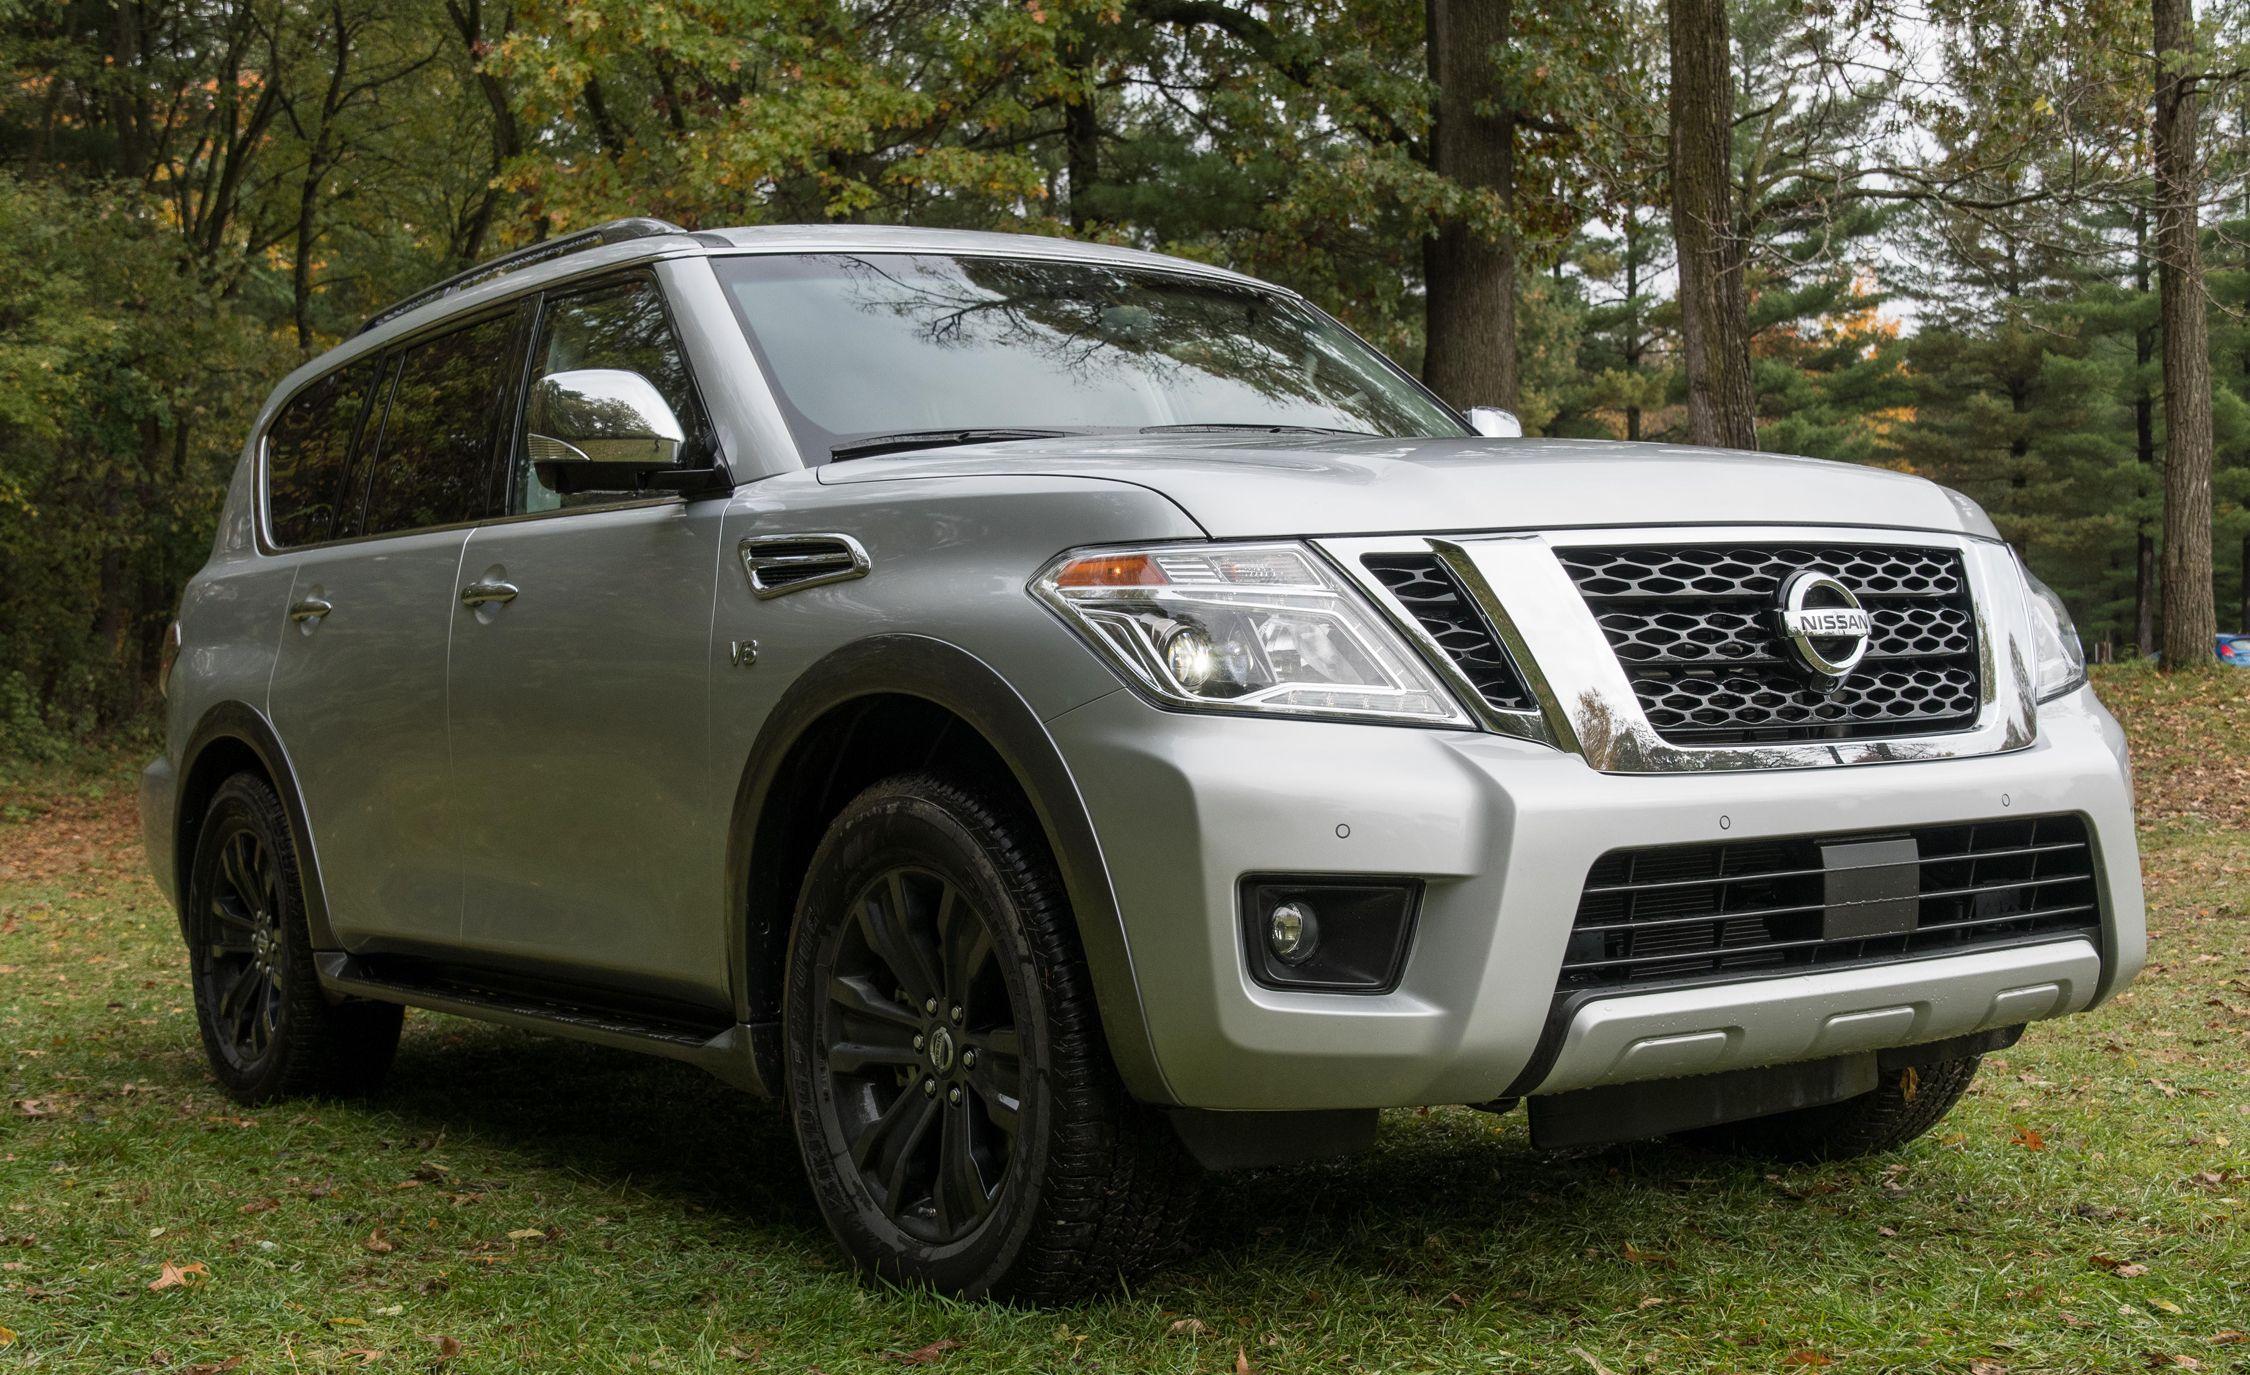 2018 Nissan Armada Fuel Economy Review Car And Driver